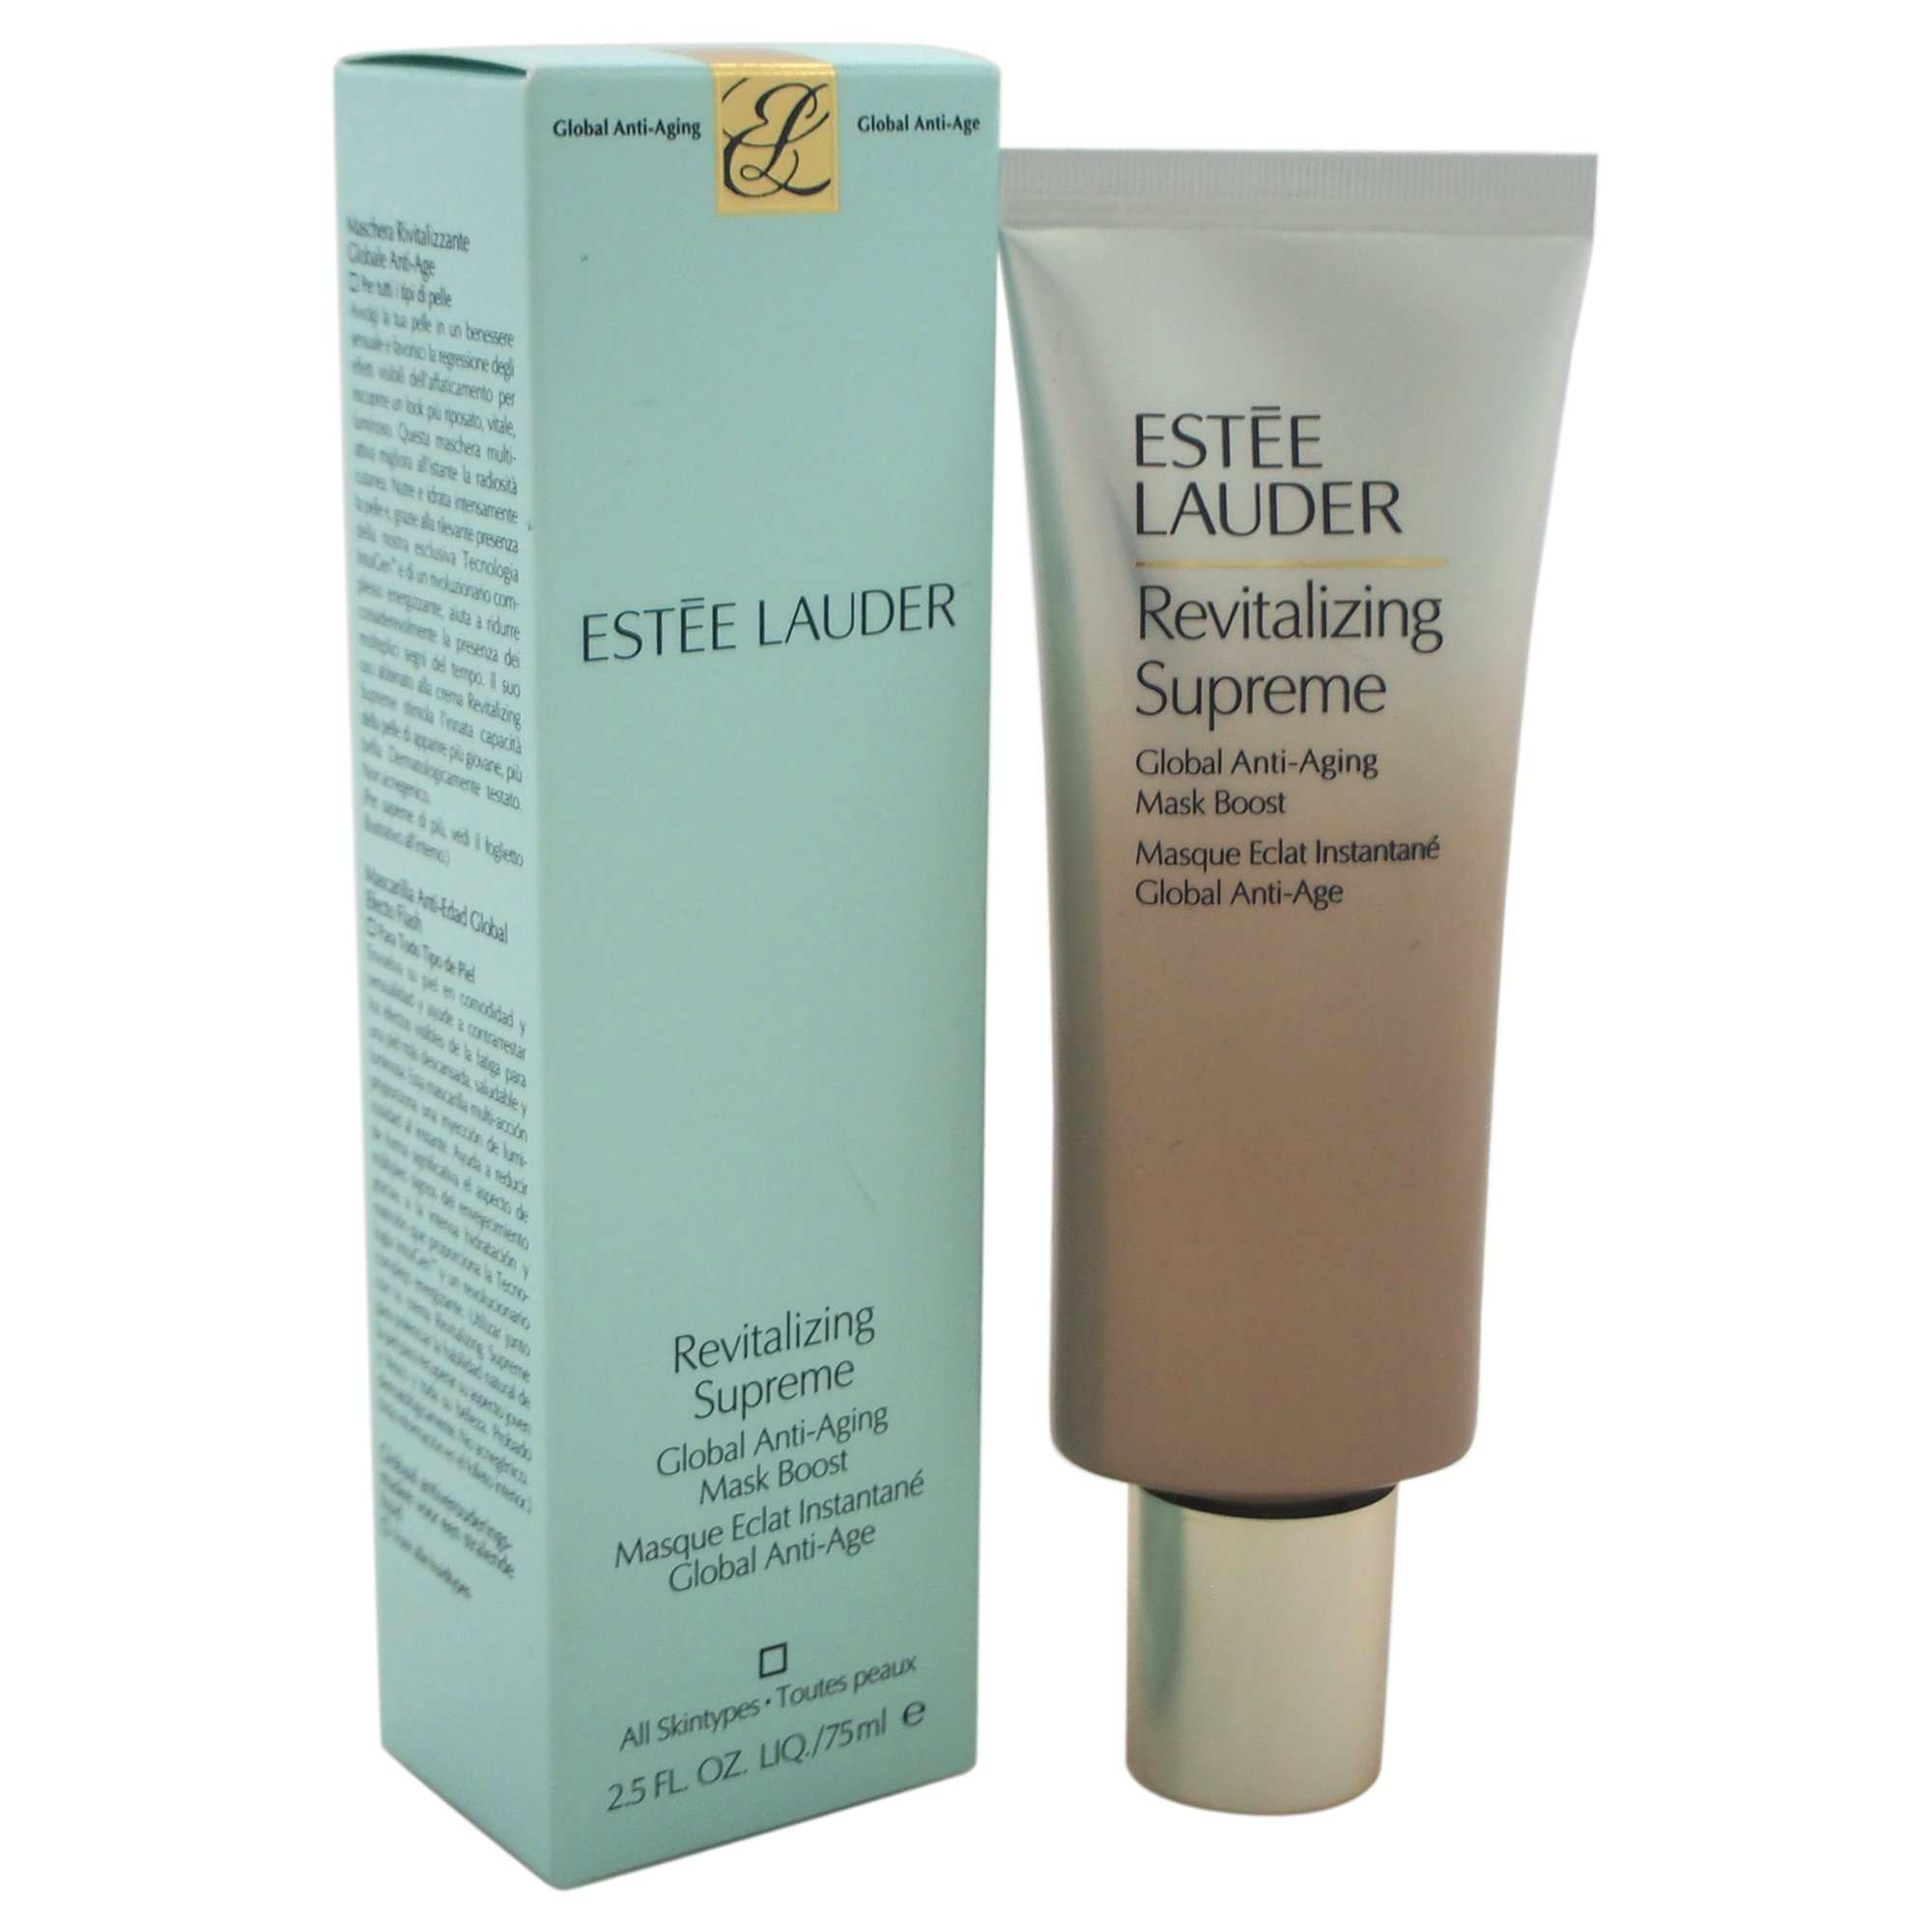 Revitalizing Supreme Global Anti-Aging Mask Boost by Estée Lauder #20